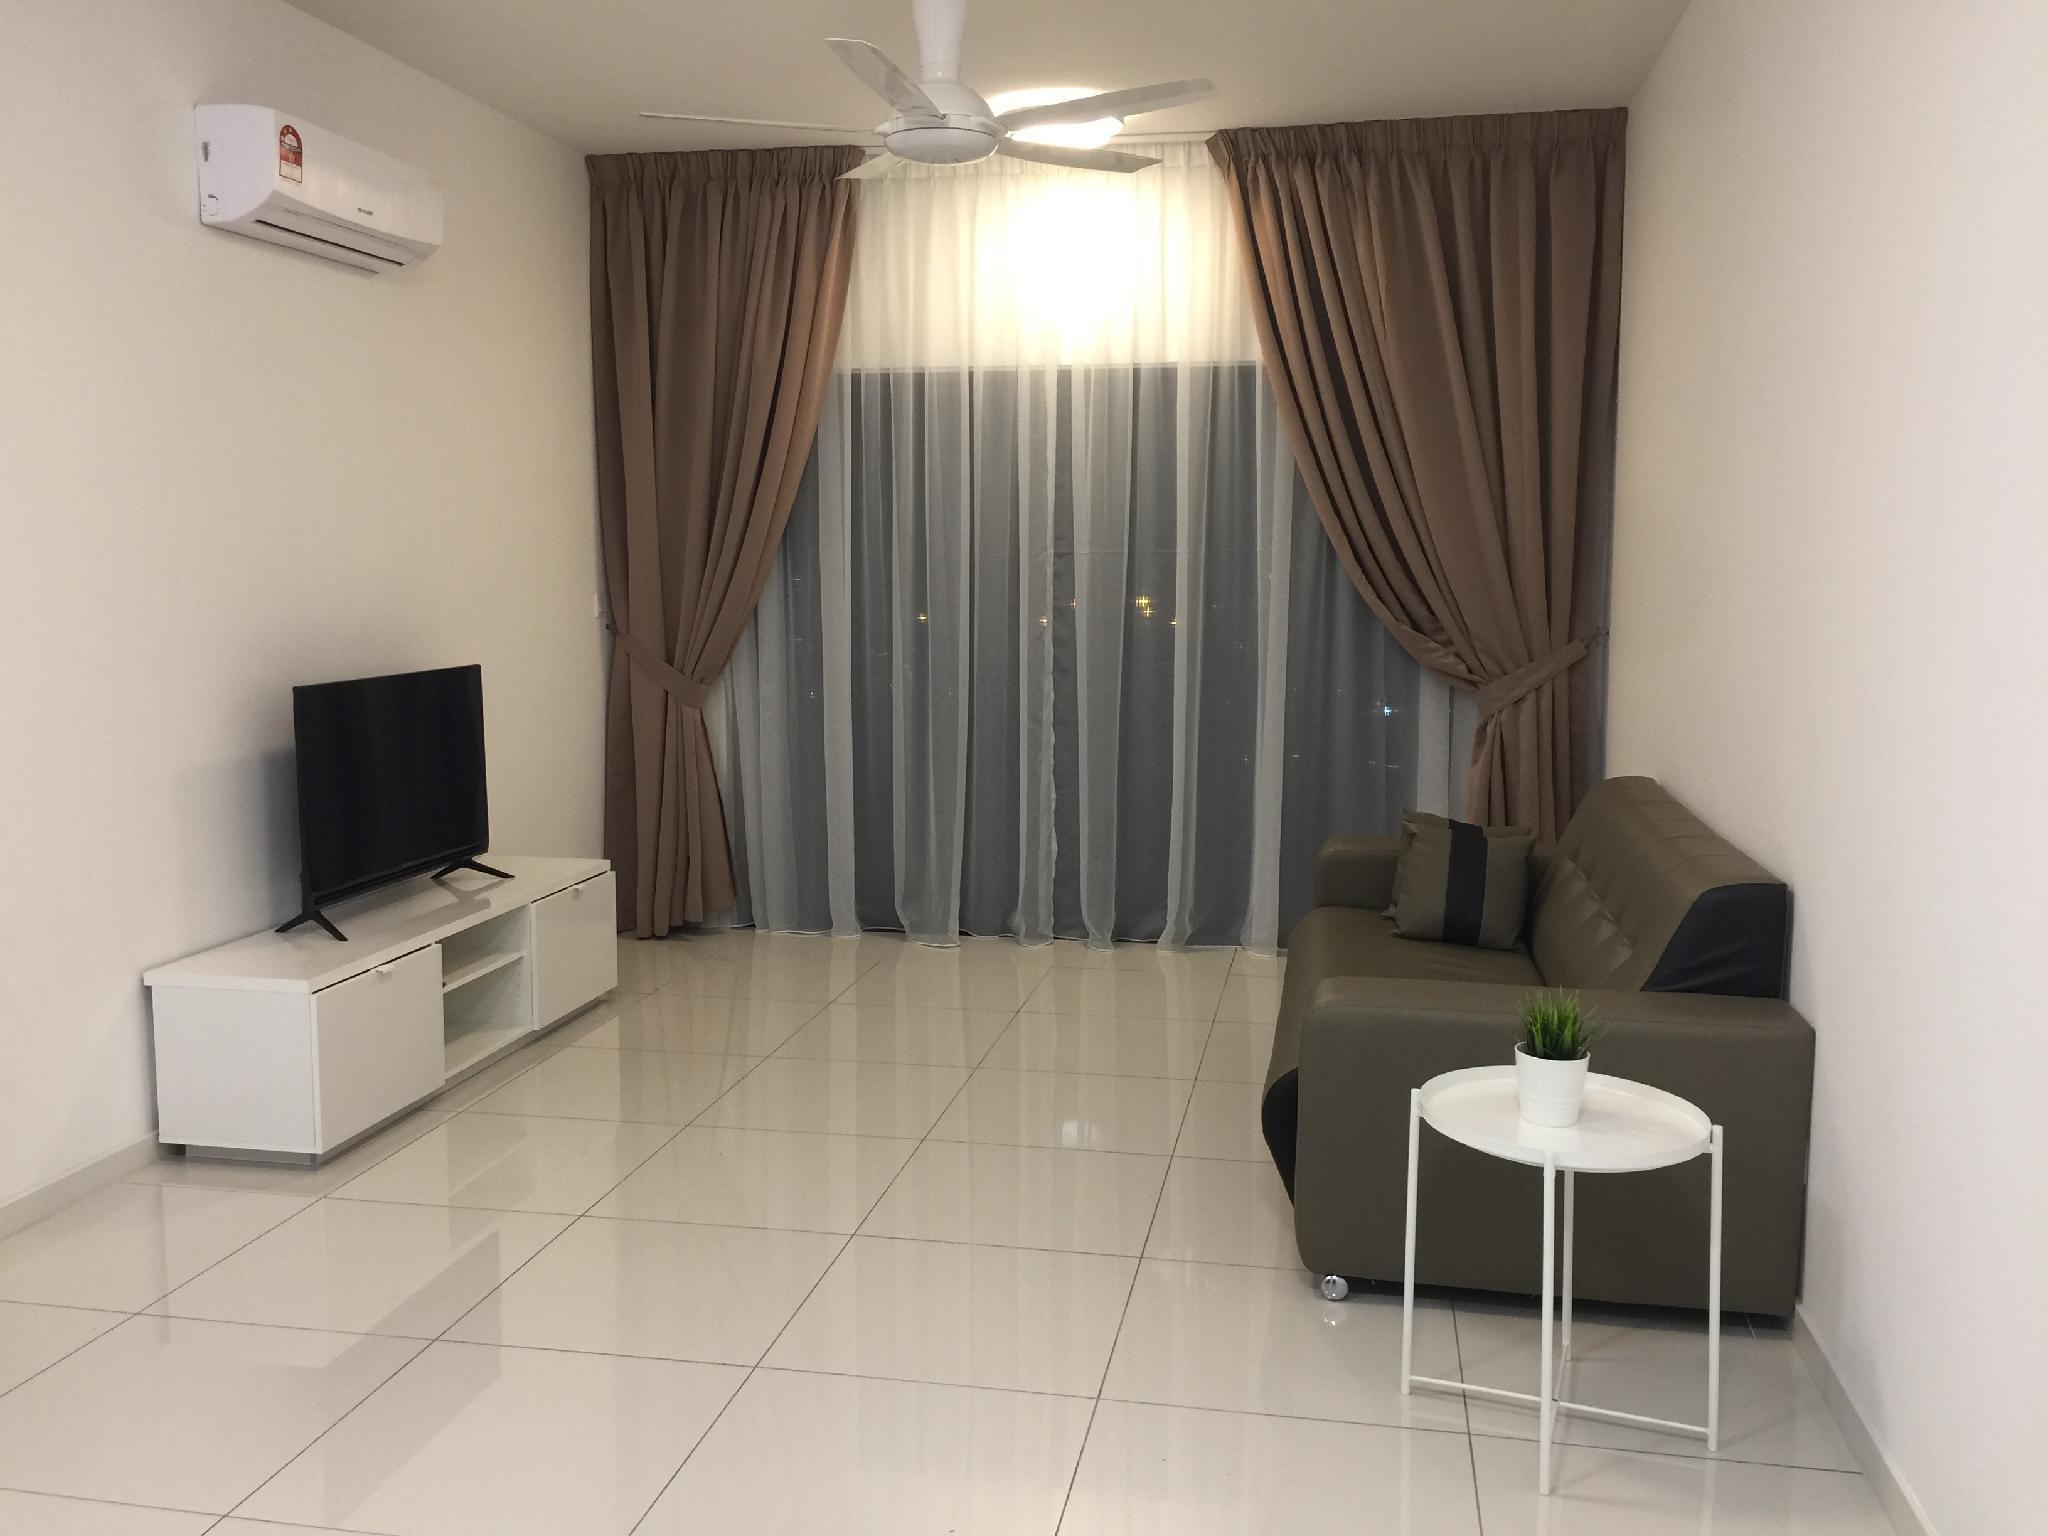 MM Suite @ EMIRA, Shah Alam - Shah Alam - - Malaysia Hotels